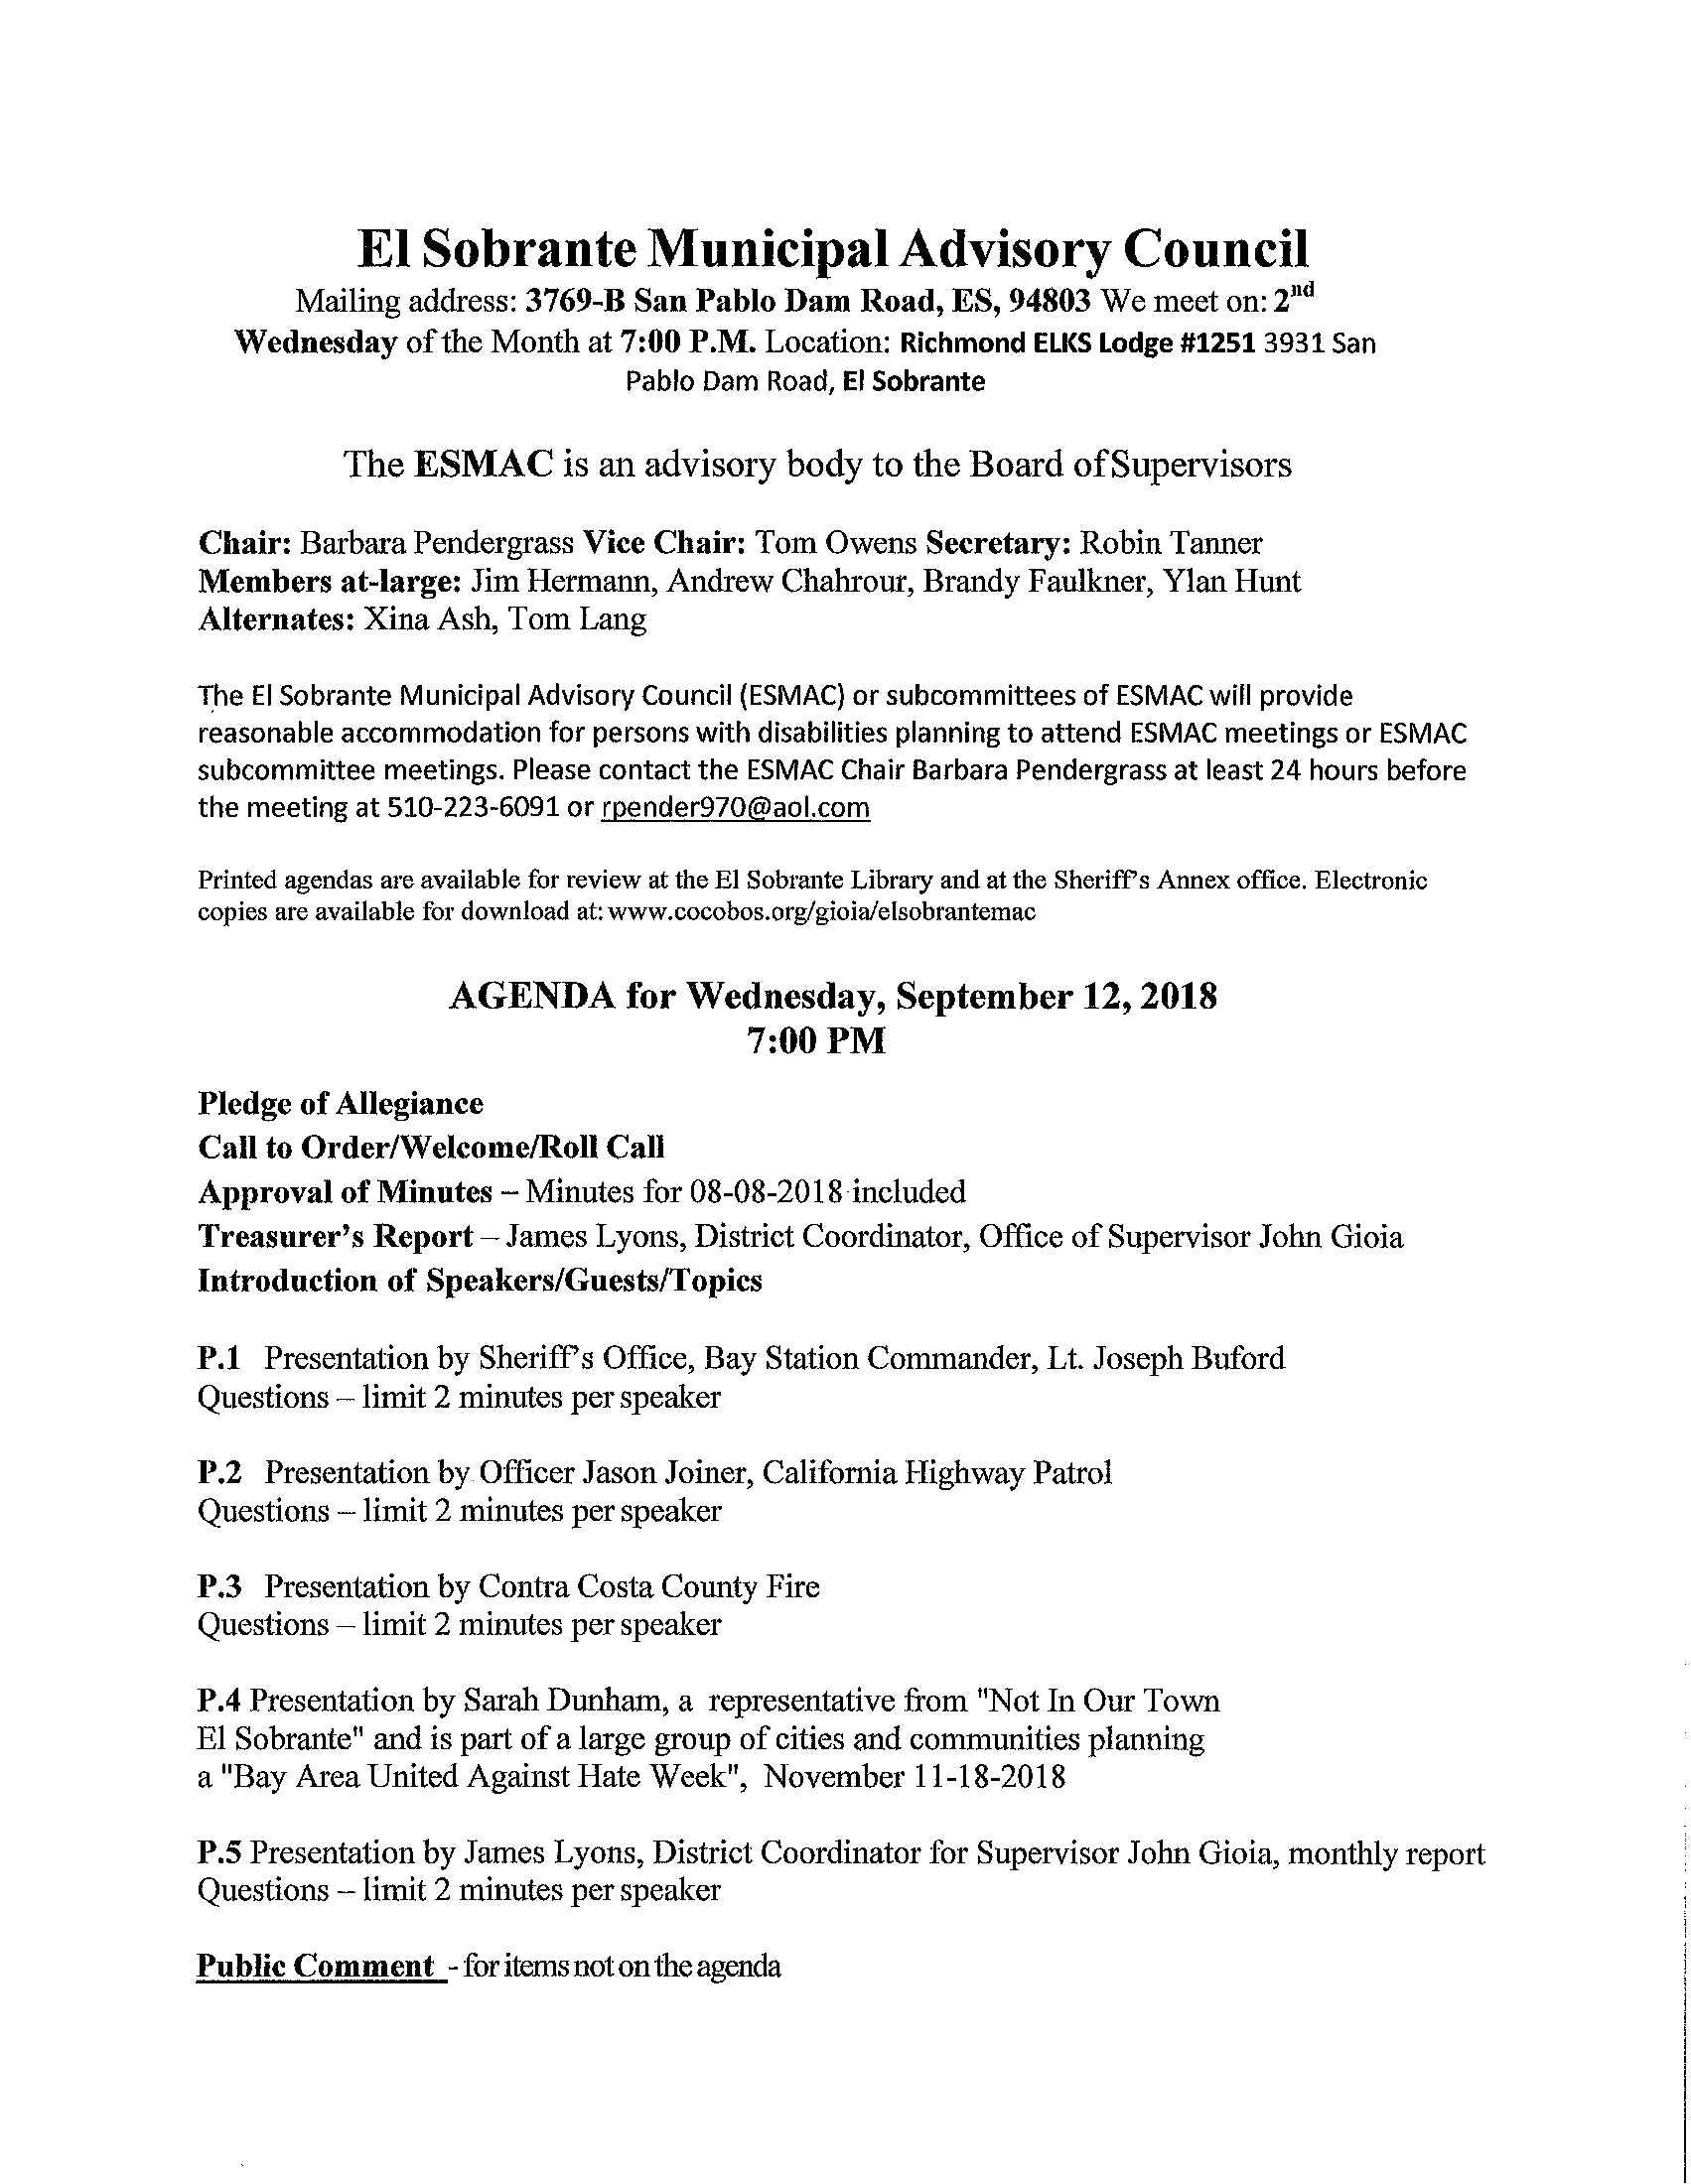 ESMAC Agenda 09.12.2018 (22 Pages)_1.jpg